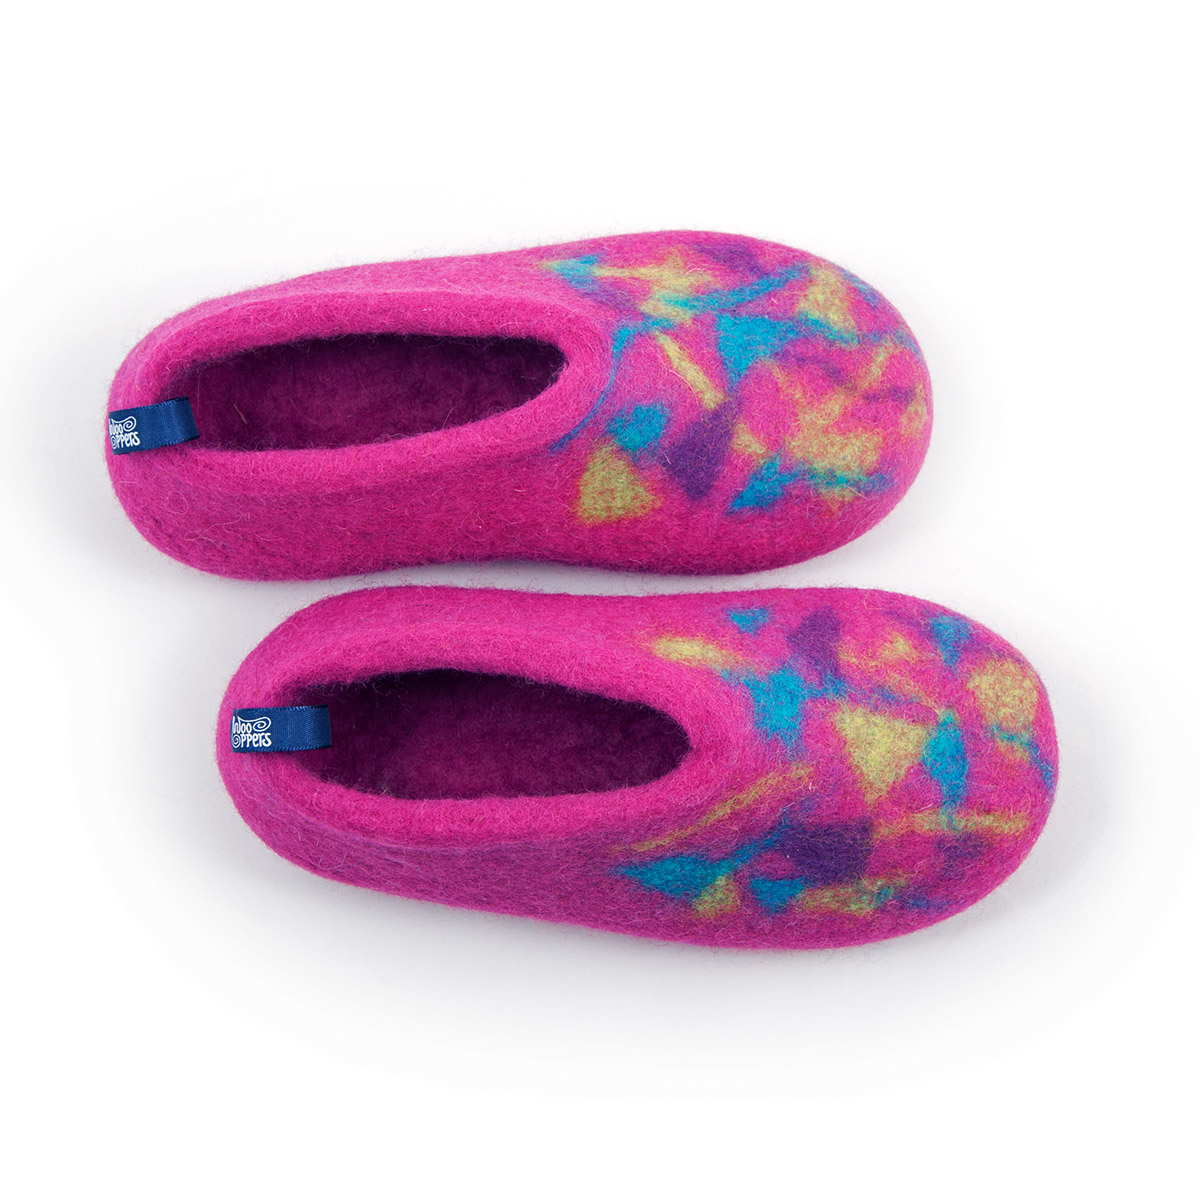 winter slippers for kids CONFETTI BITS fuchsia pink